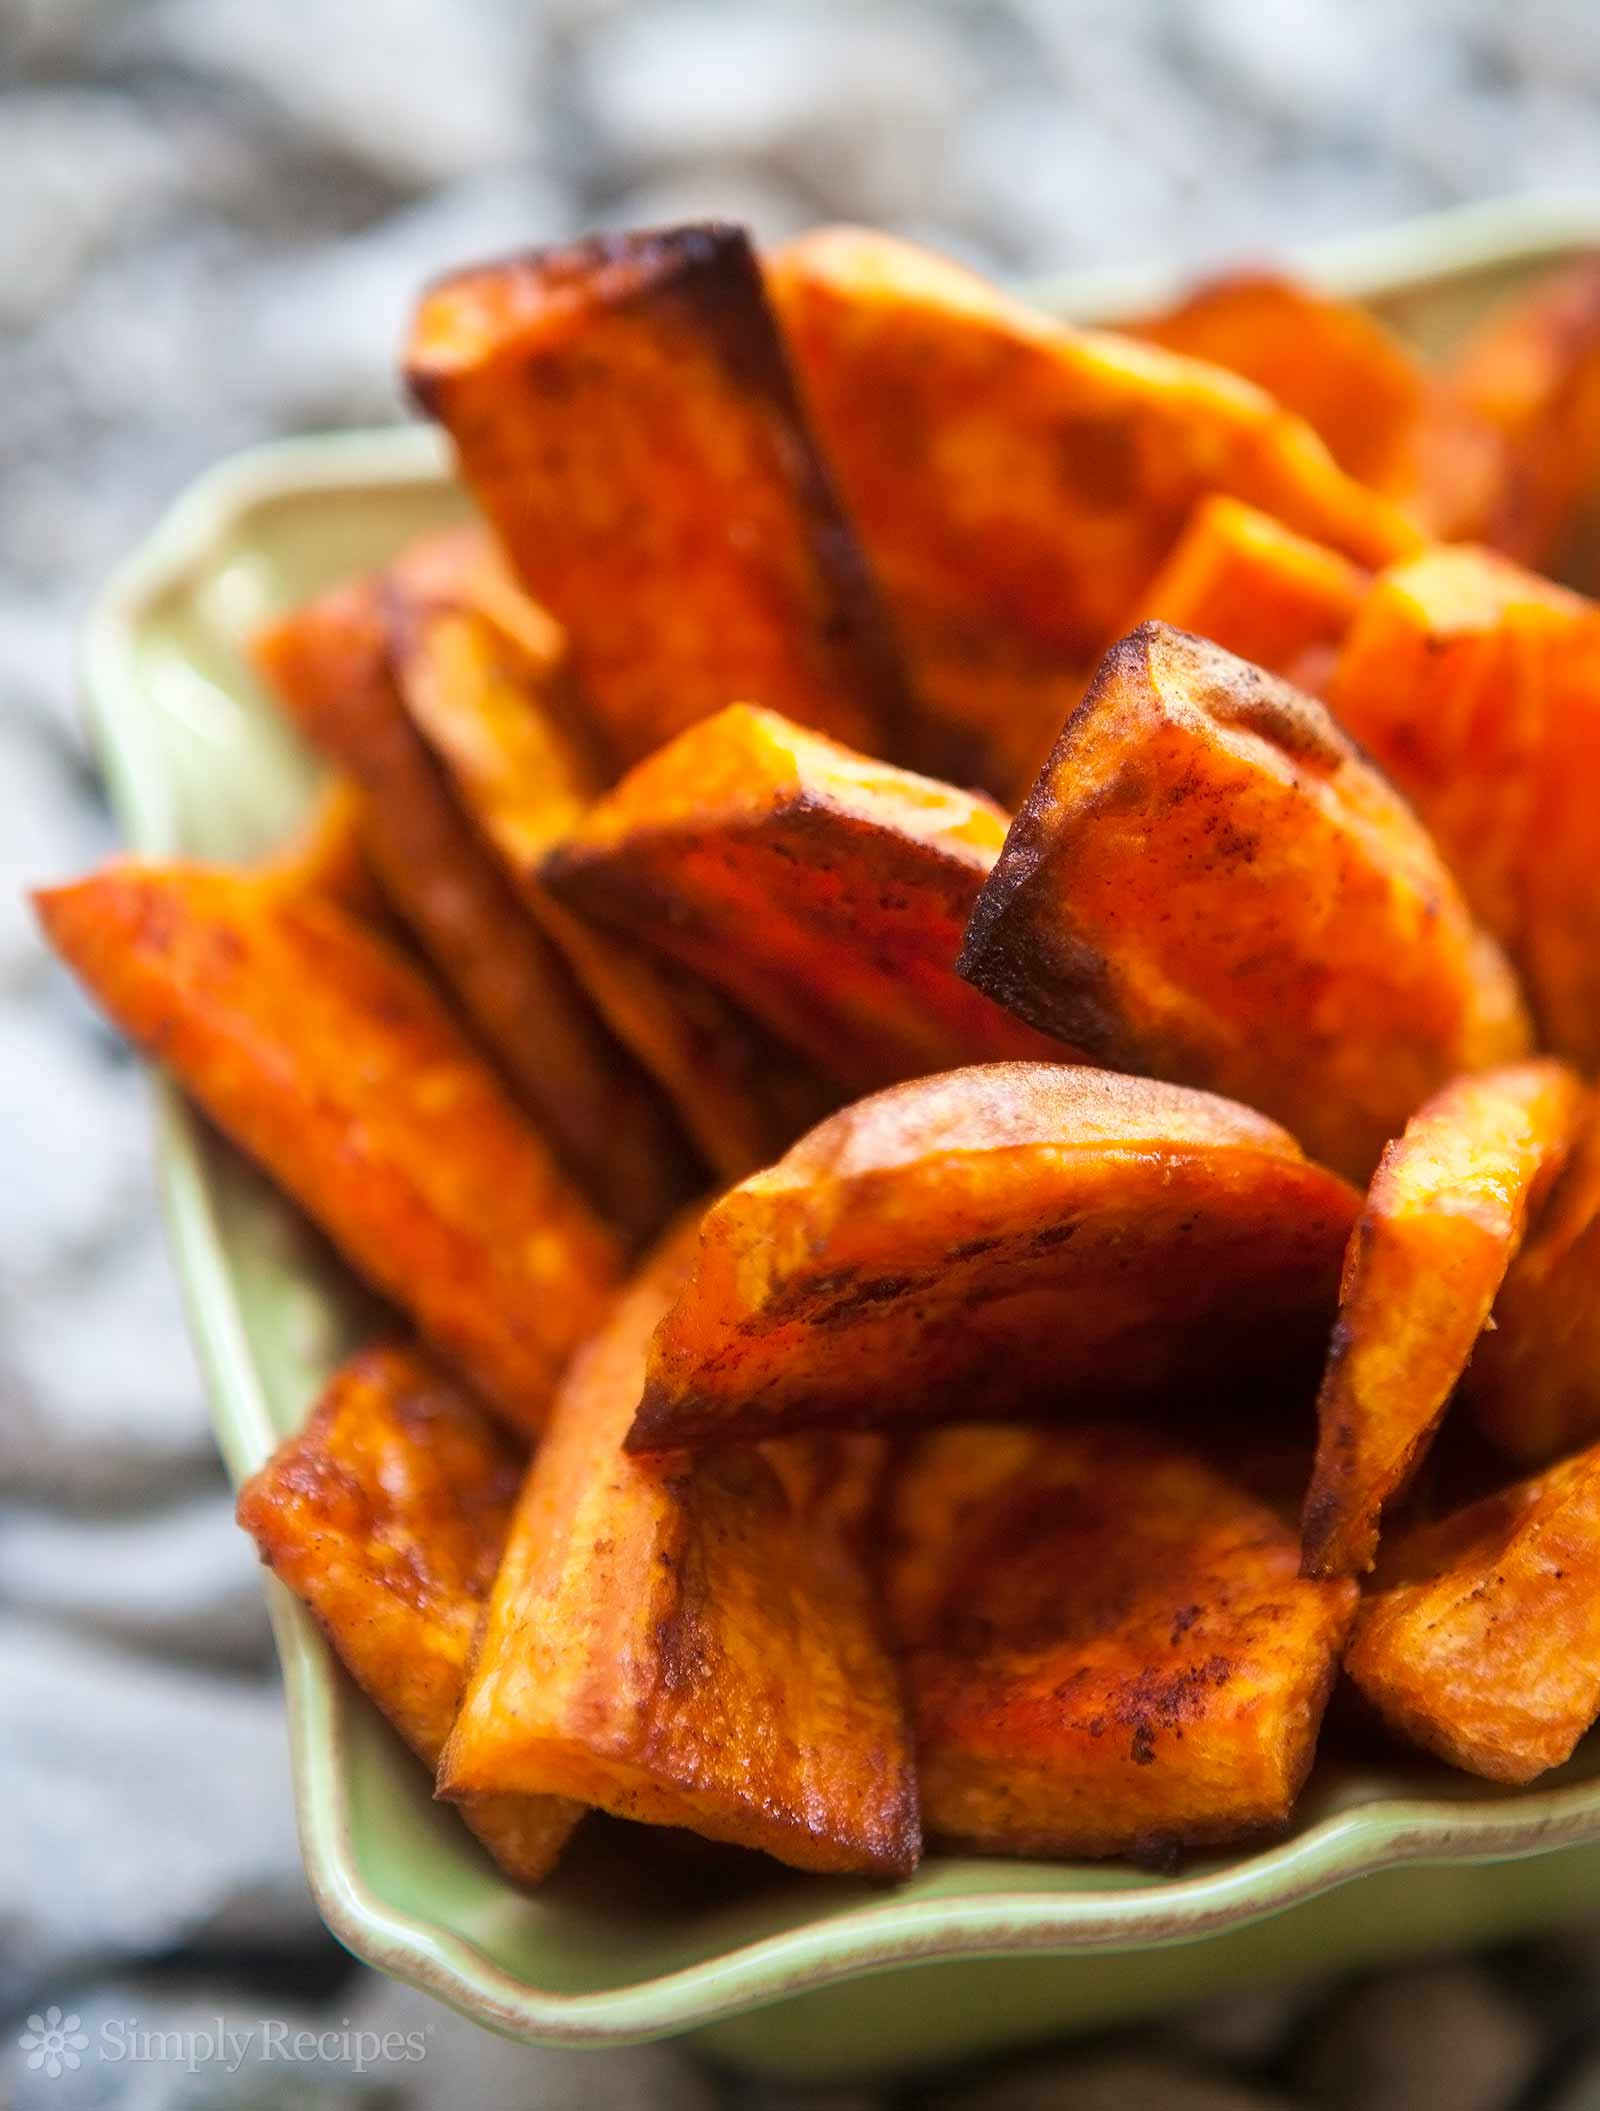 Cooking Sweet Potato  Oven Baked Sweet Potato Fries Recipe